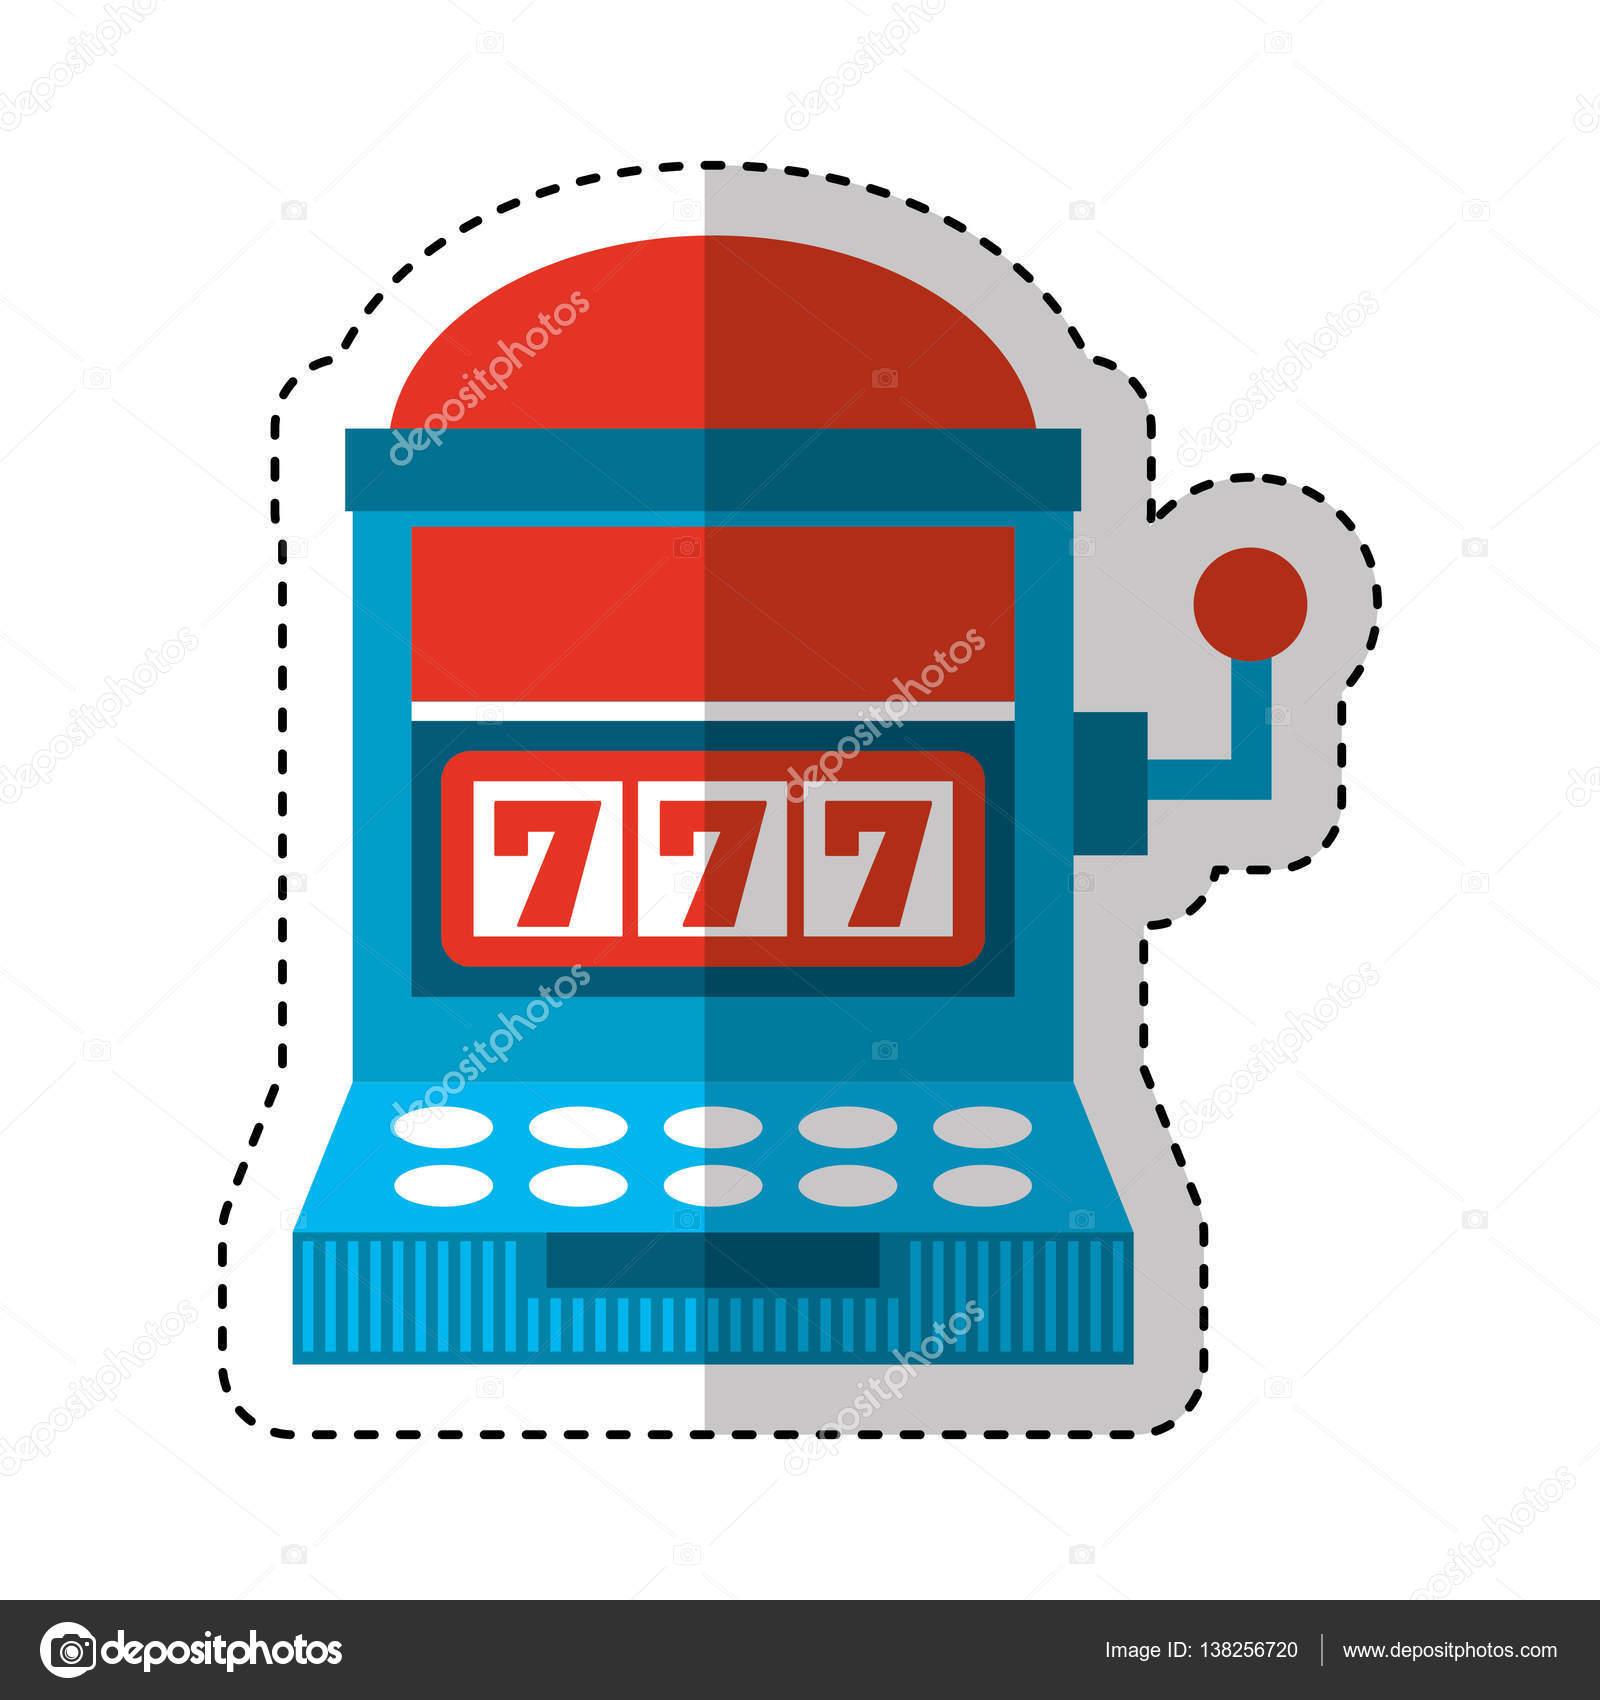 All Slots casino tragamonedas bono sin deposito - 4604